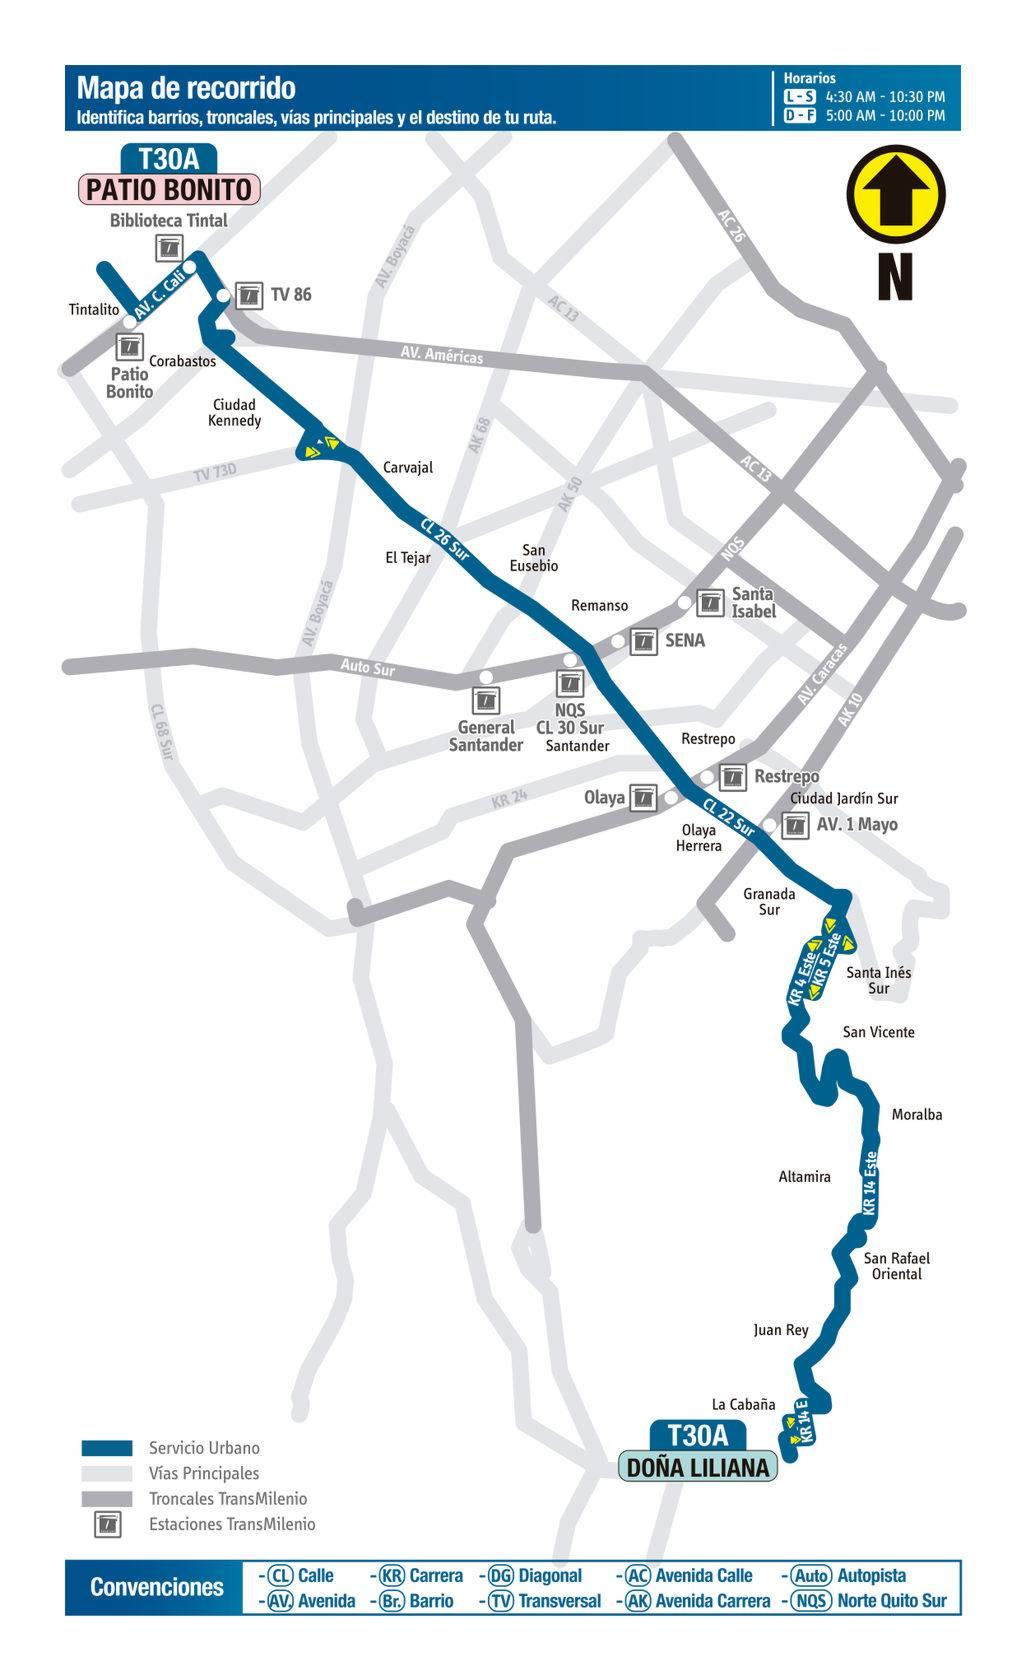 Mapa de la ruta T30 del Sistema Integrado de Transporte Público